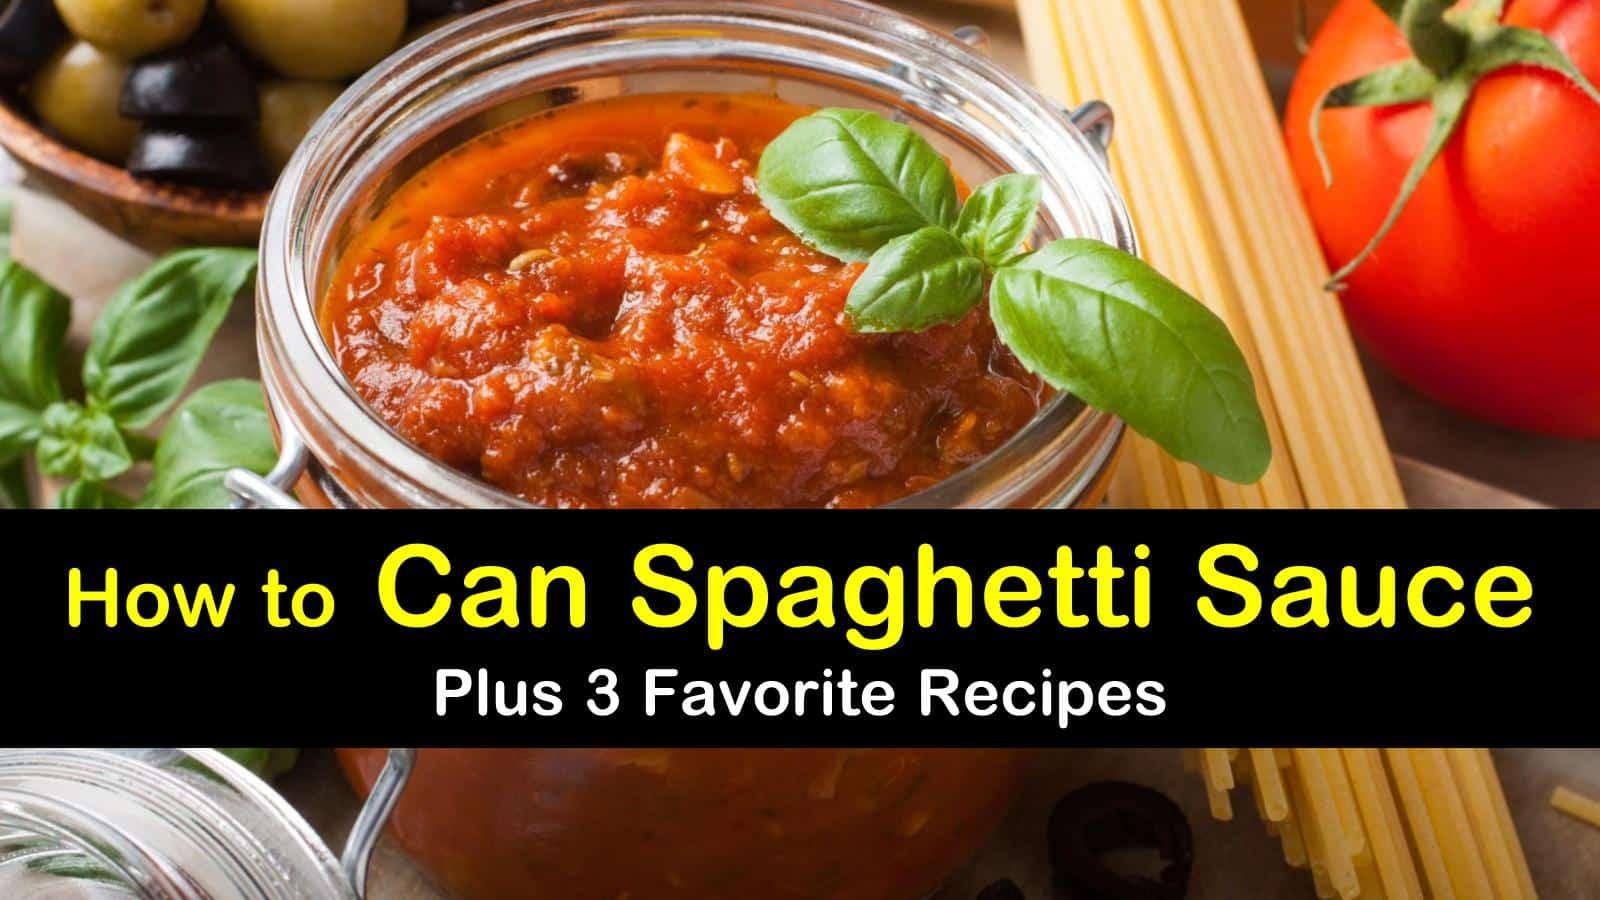 canning spaghetti sauce titleimg1